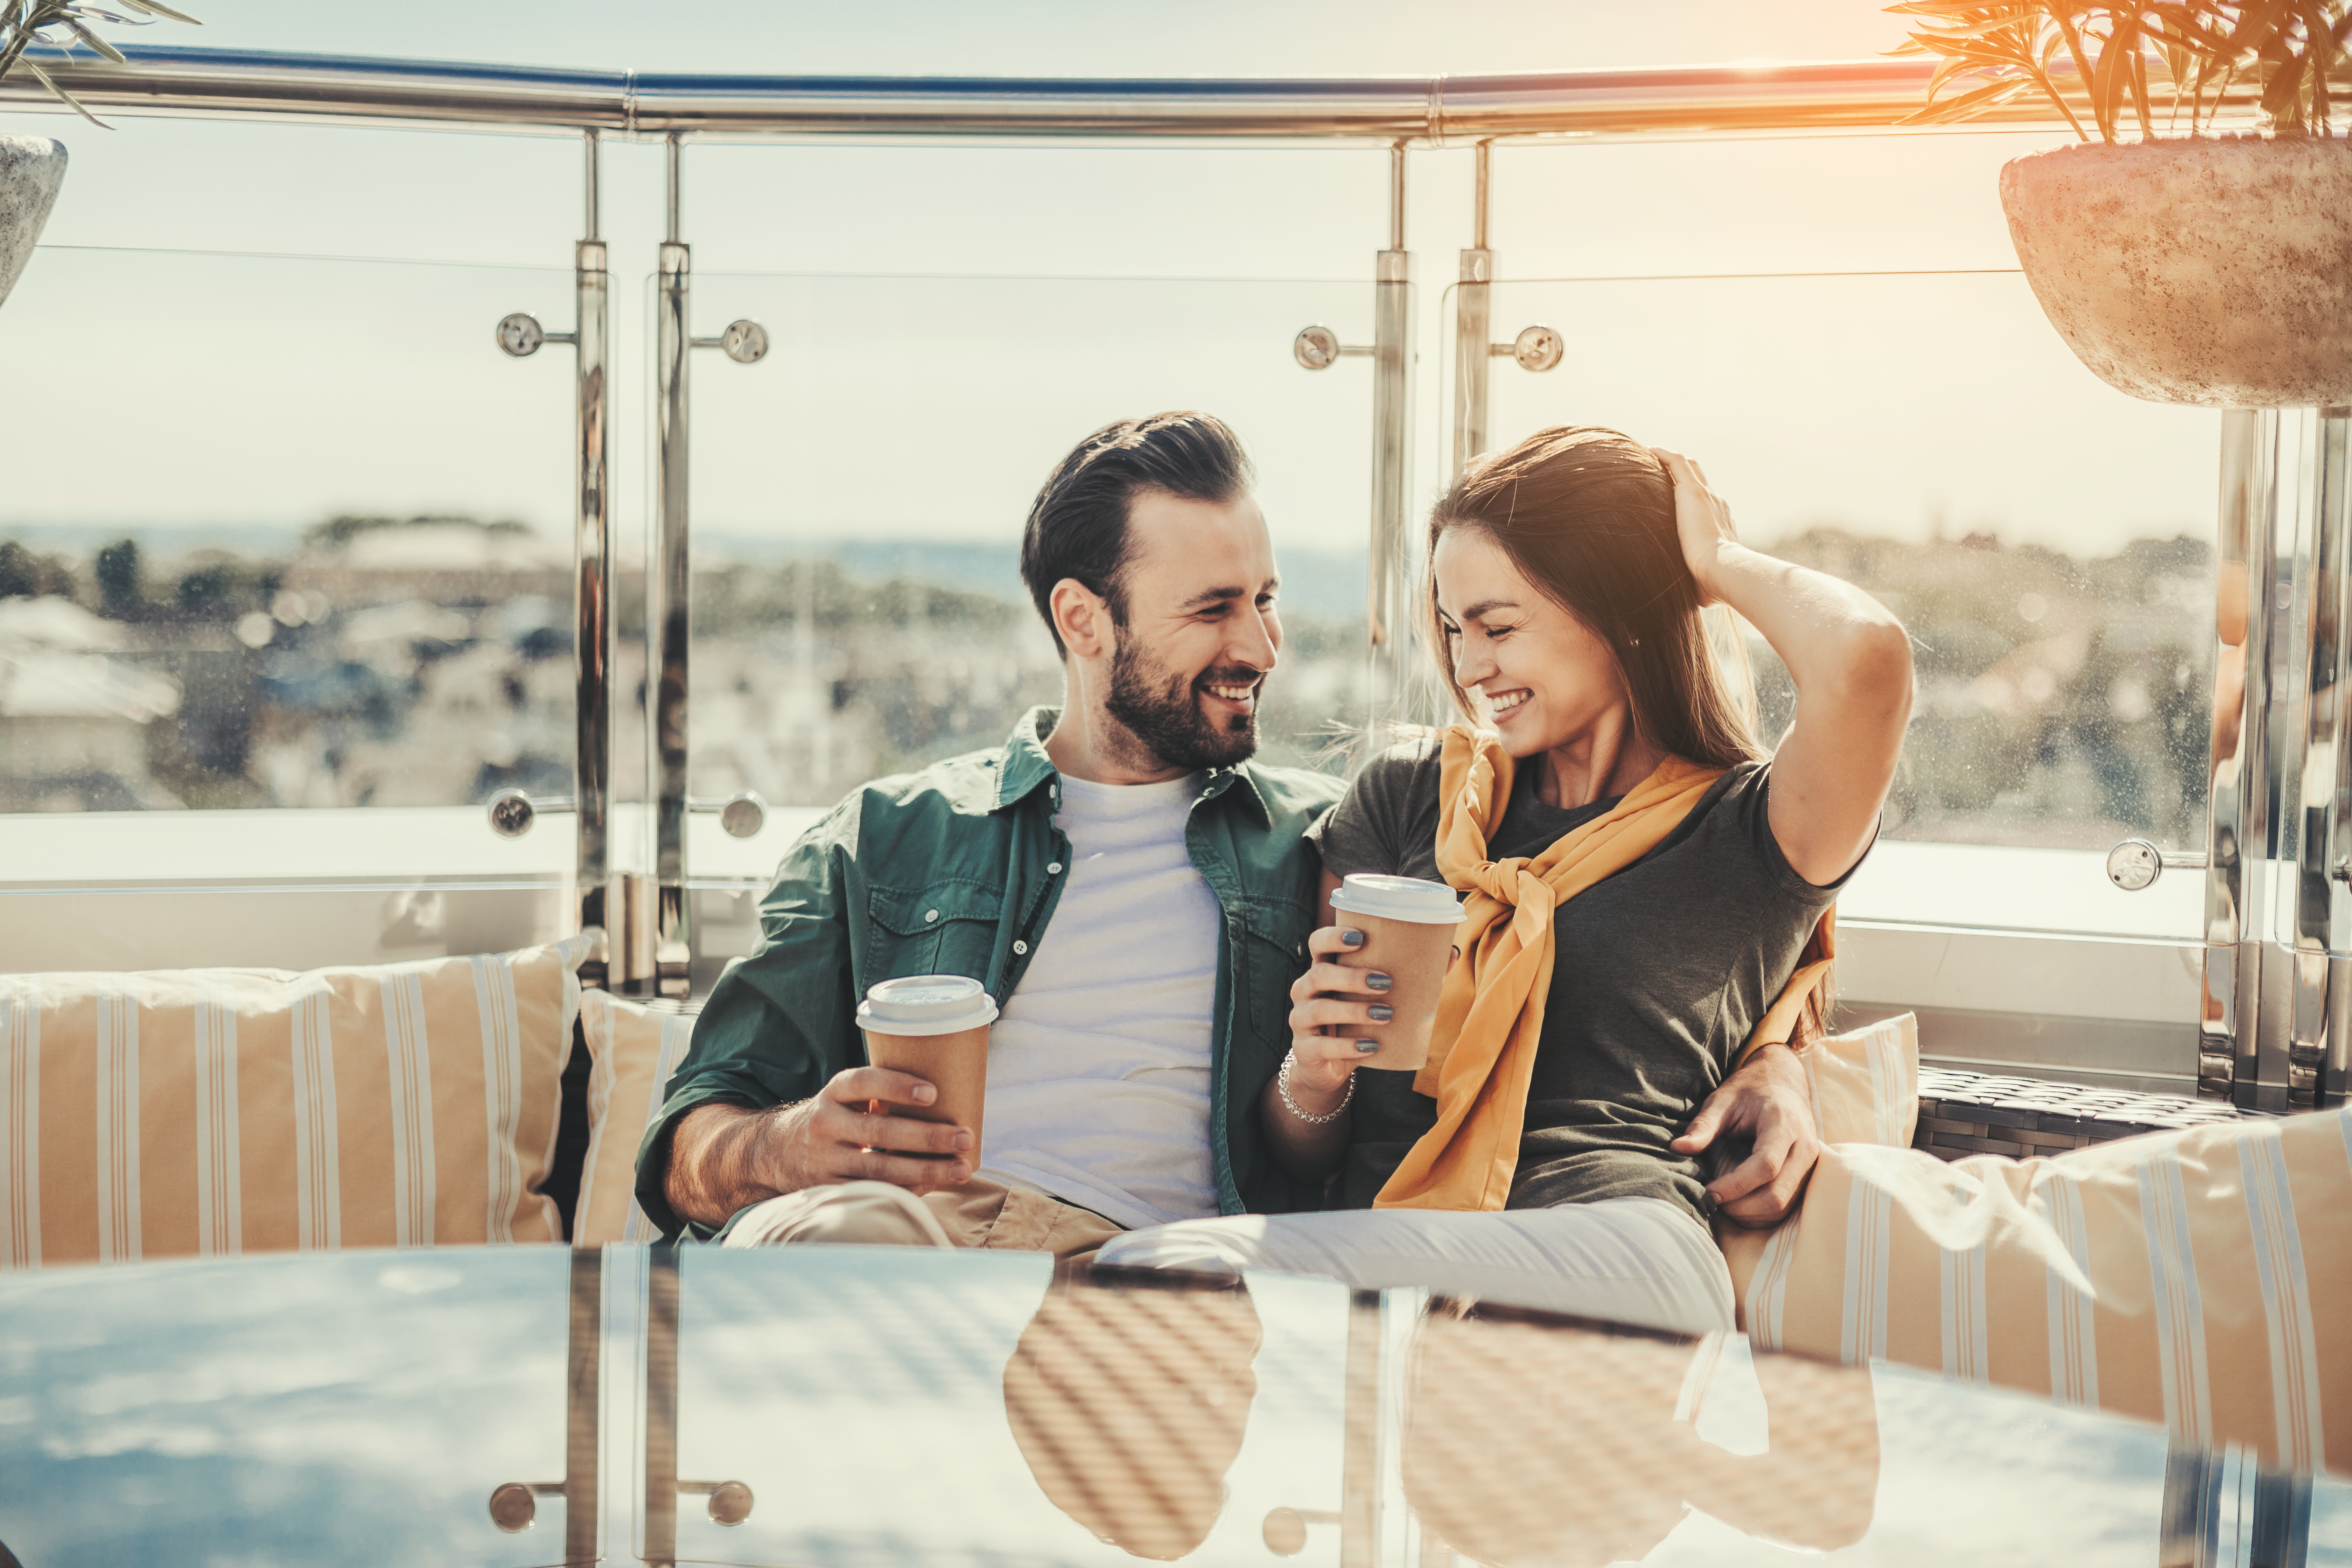 Frau und Mann trinken Kaffee